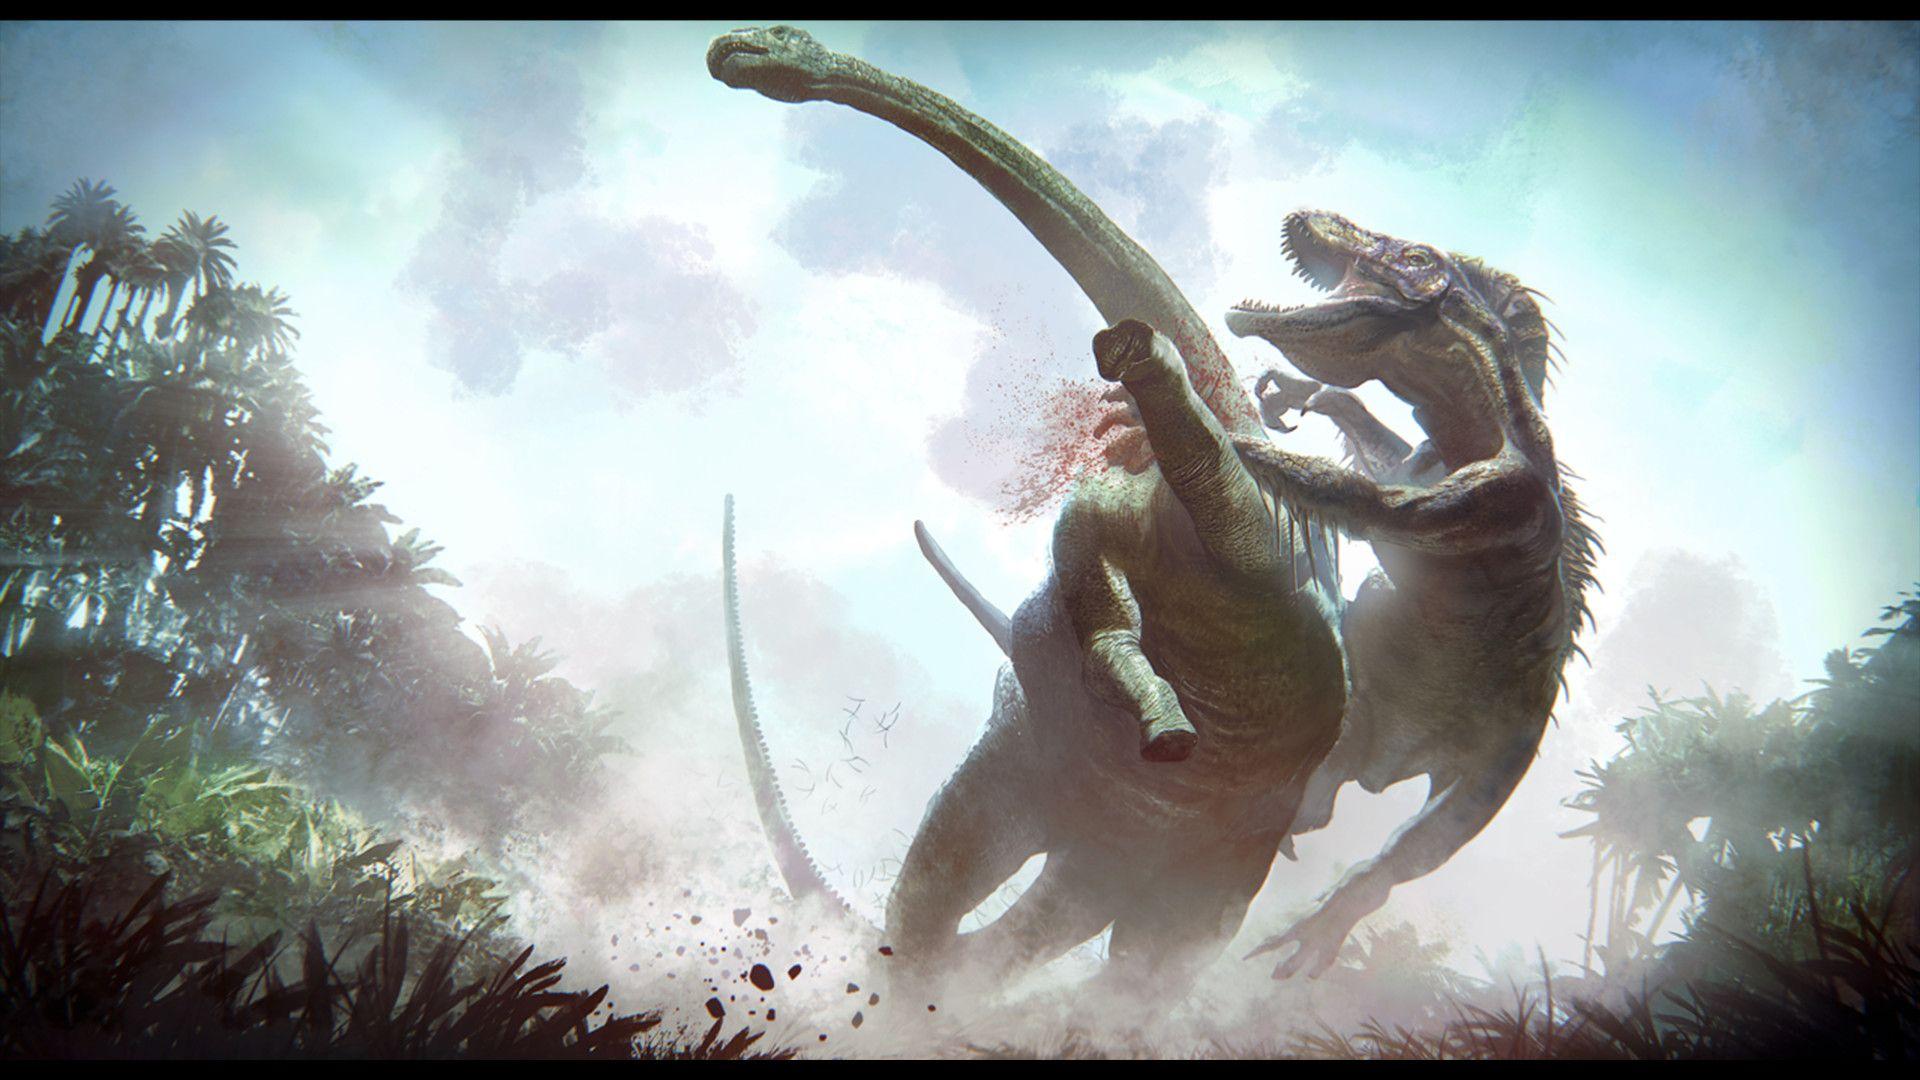 Jurassic World Concept Art Jurassic world, New jurassic